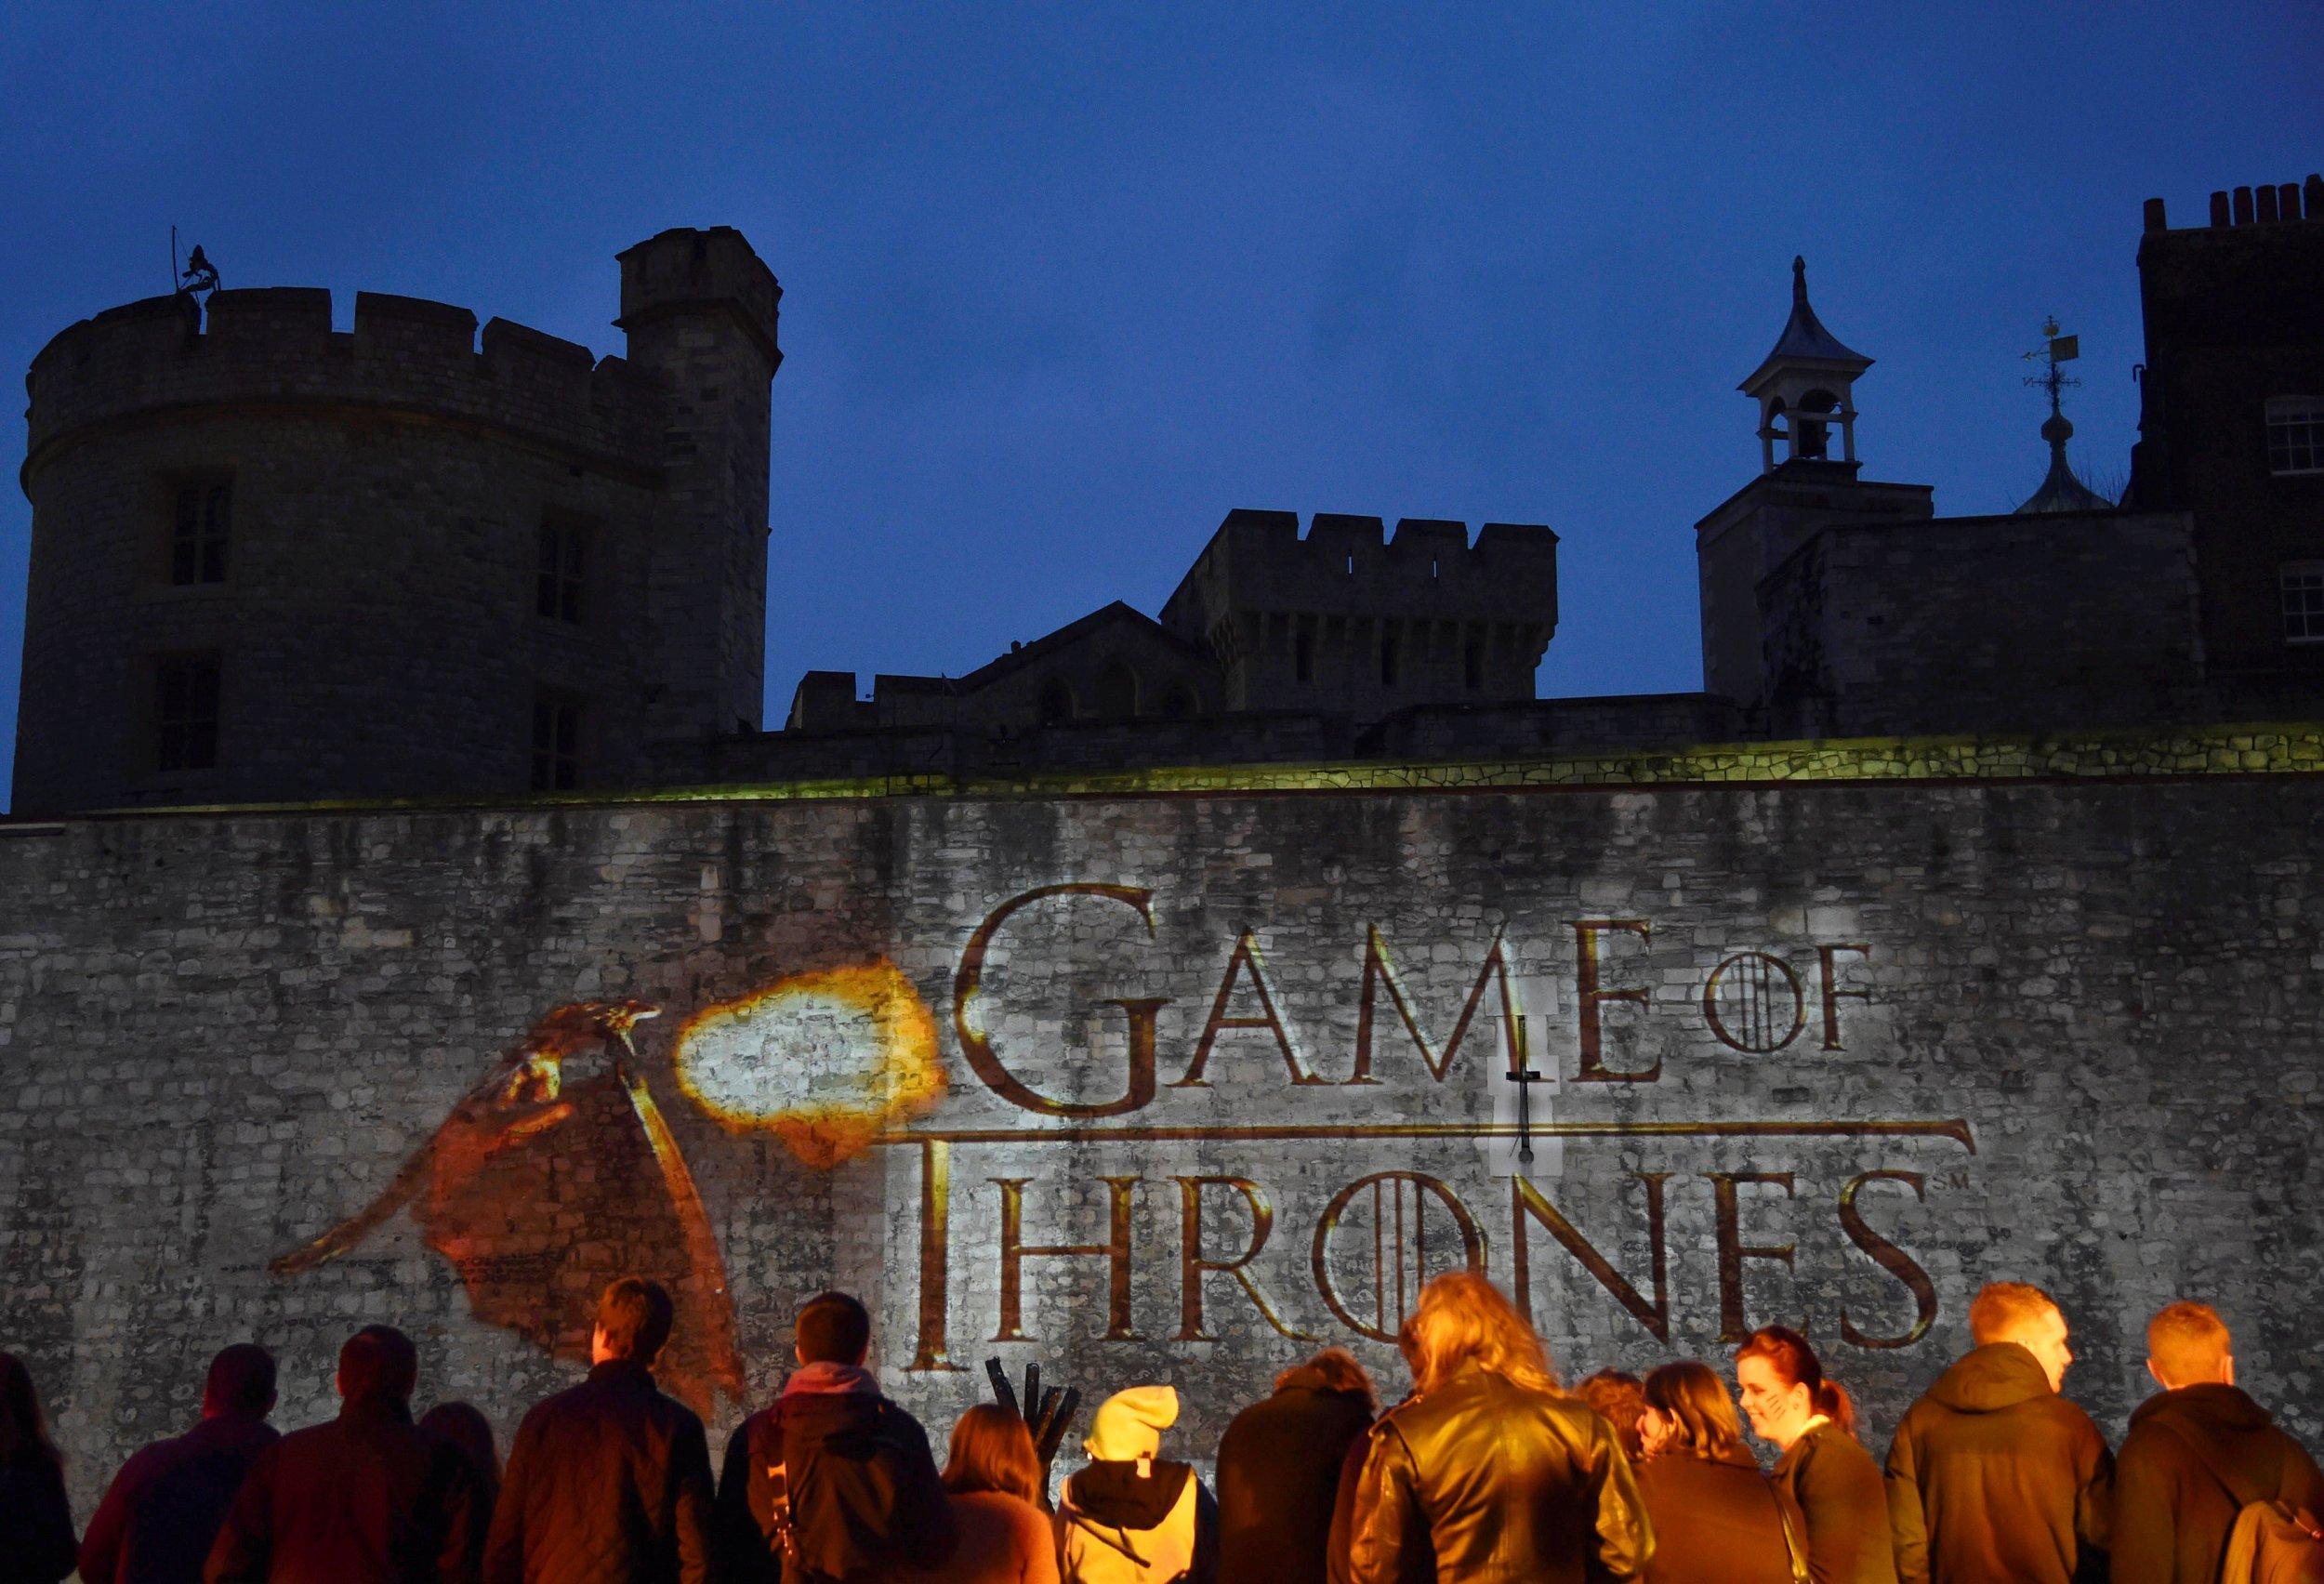 Game of Thrones season 5 premiere